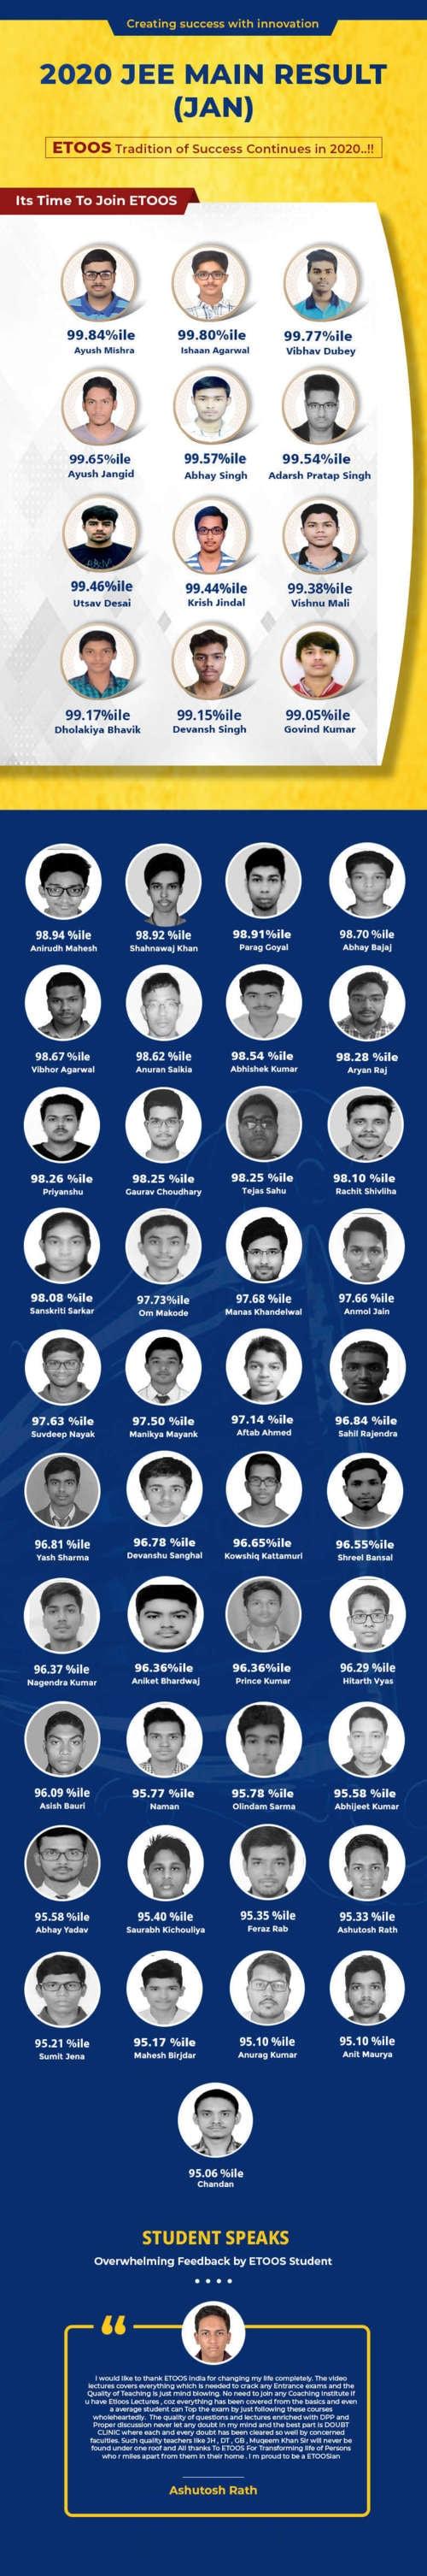 Etoosindia JEE Main Result 2020 (Jan) via Hitesh Jain